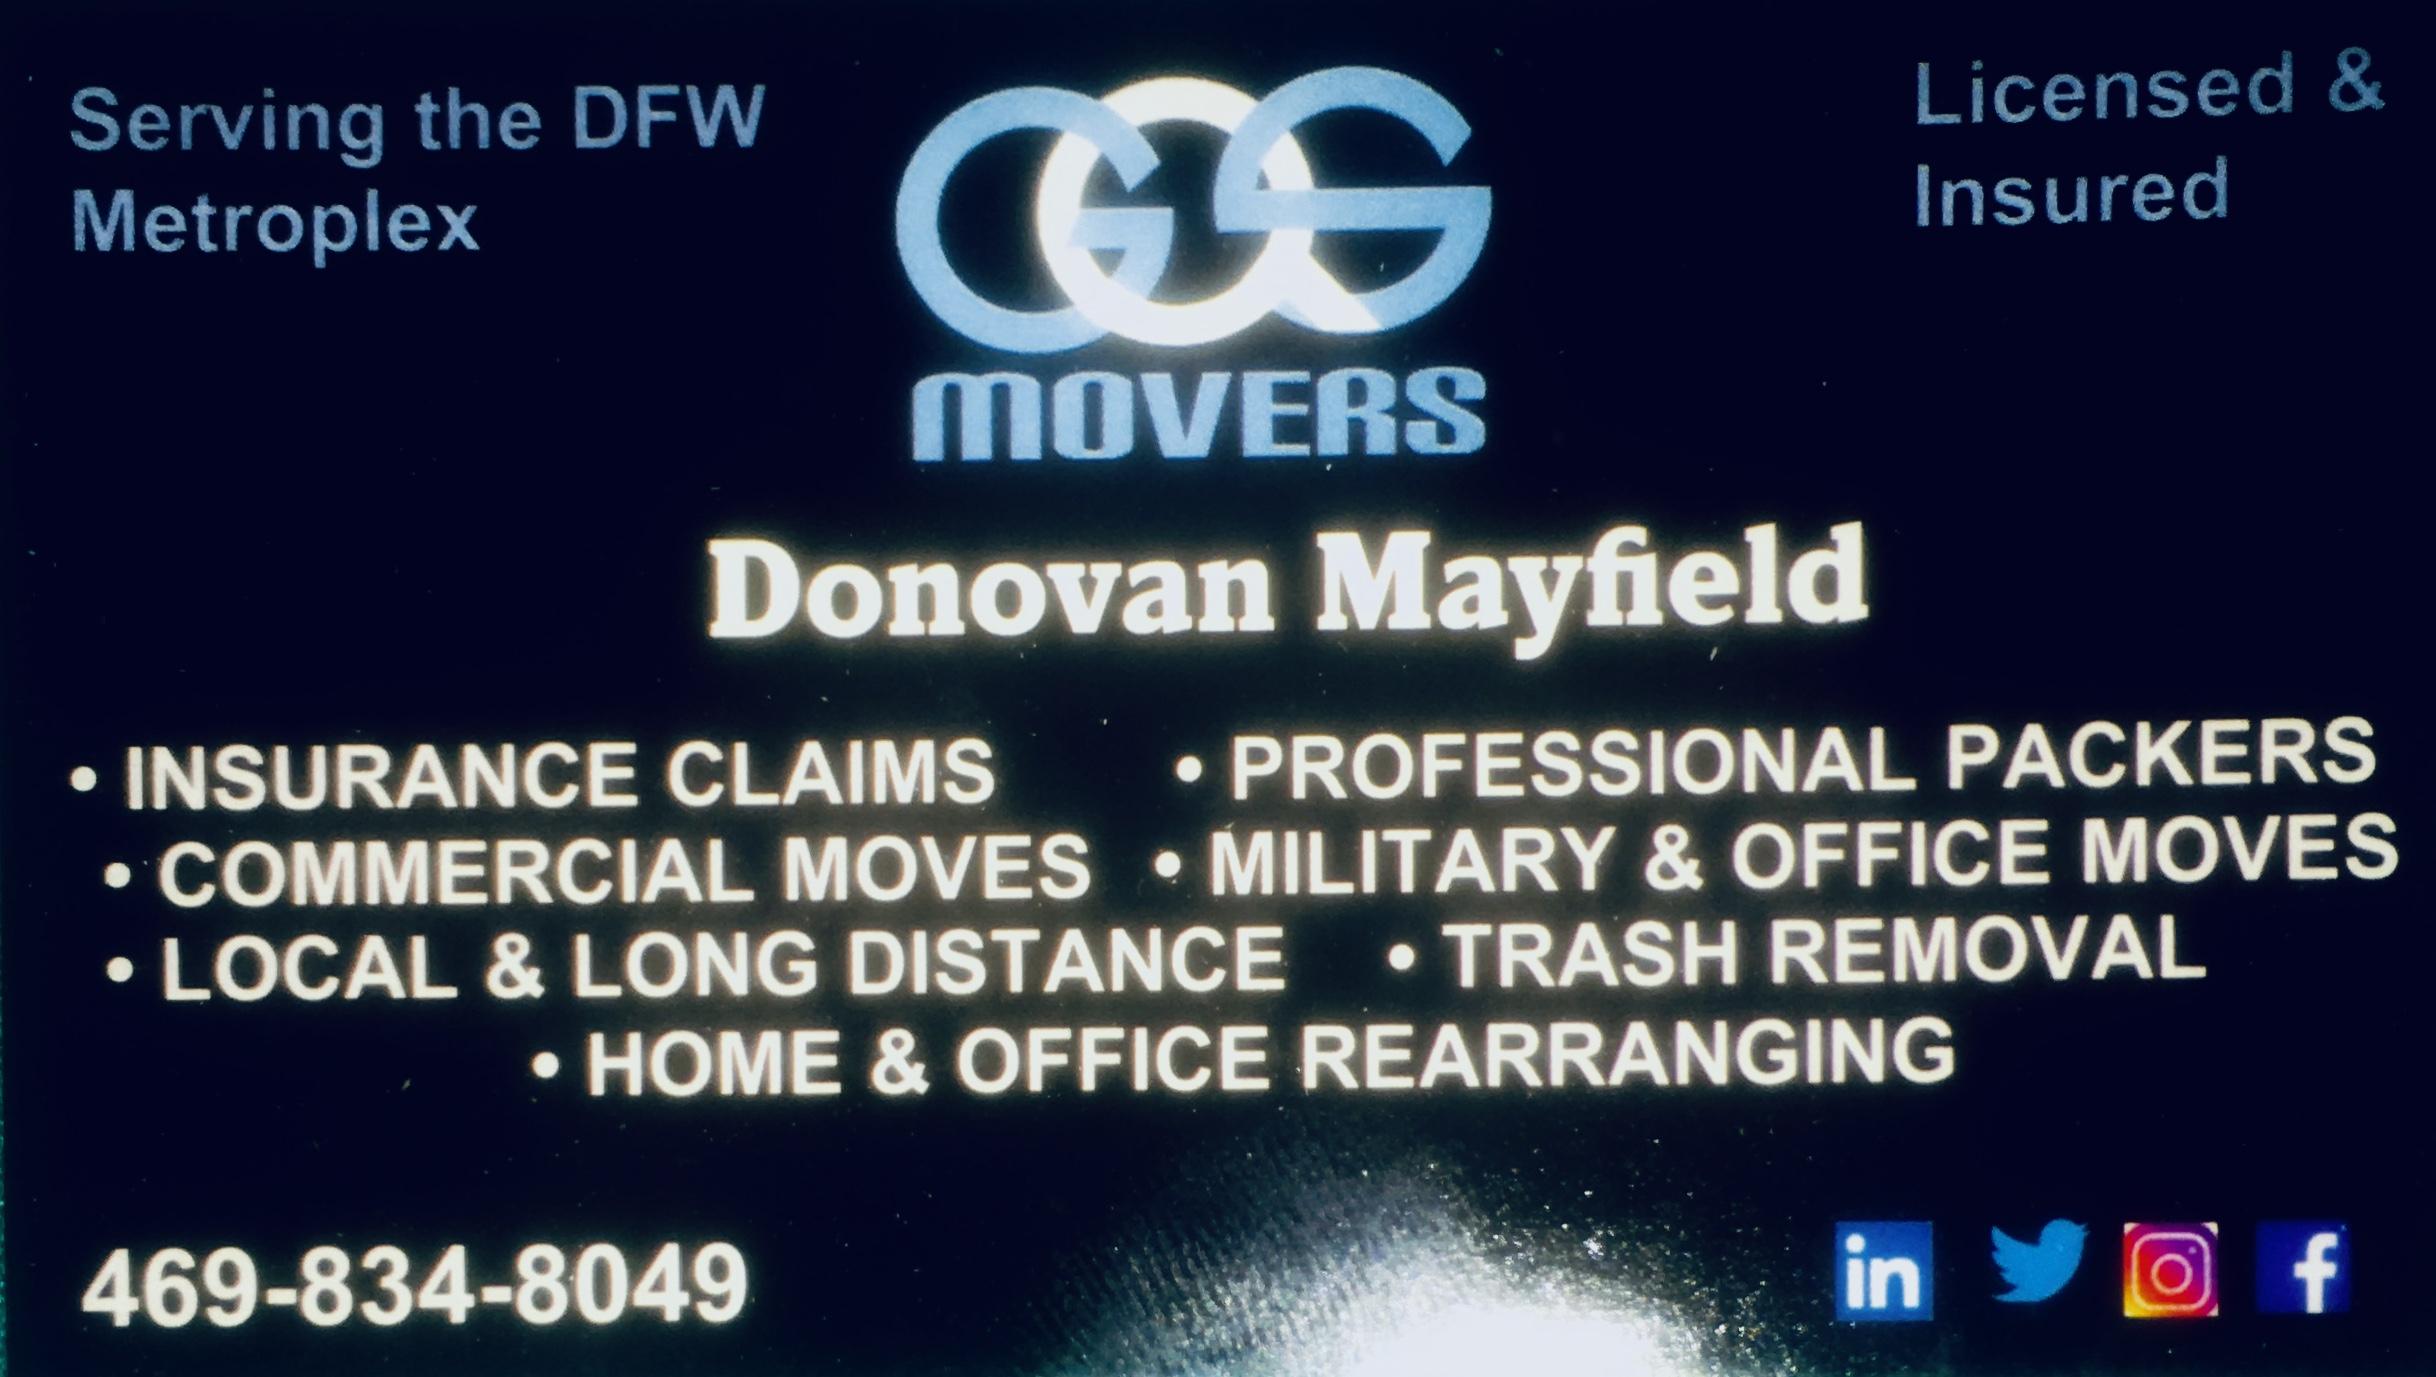 GQS Movers